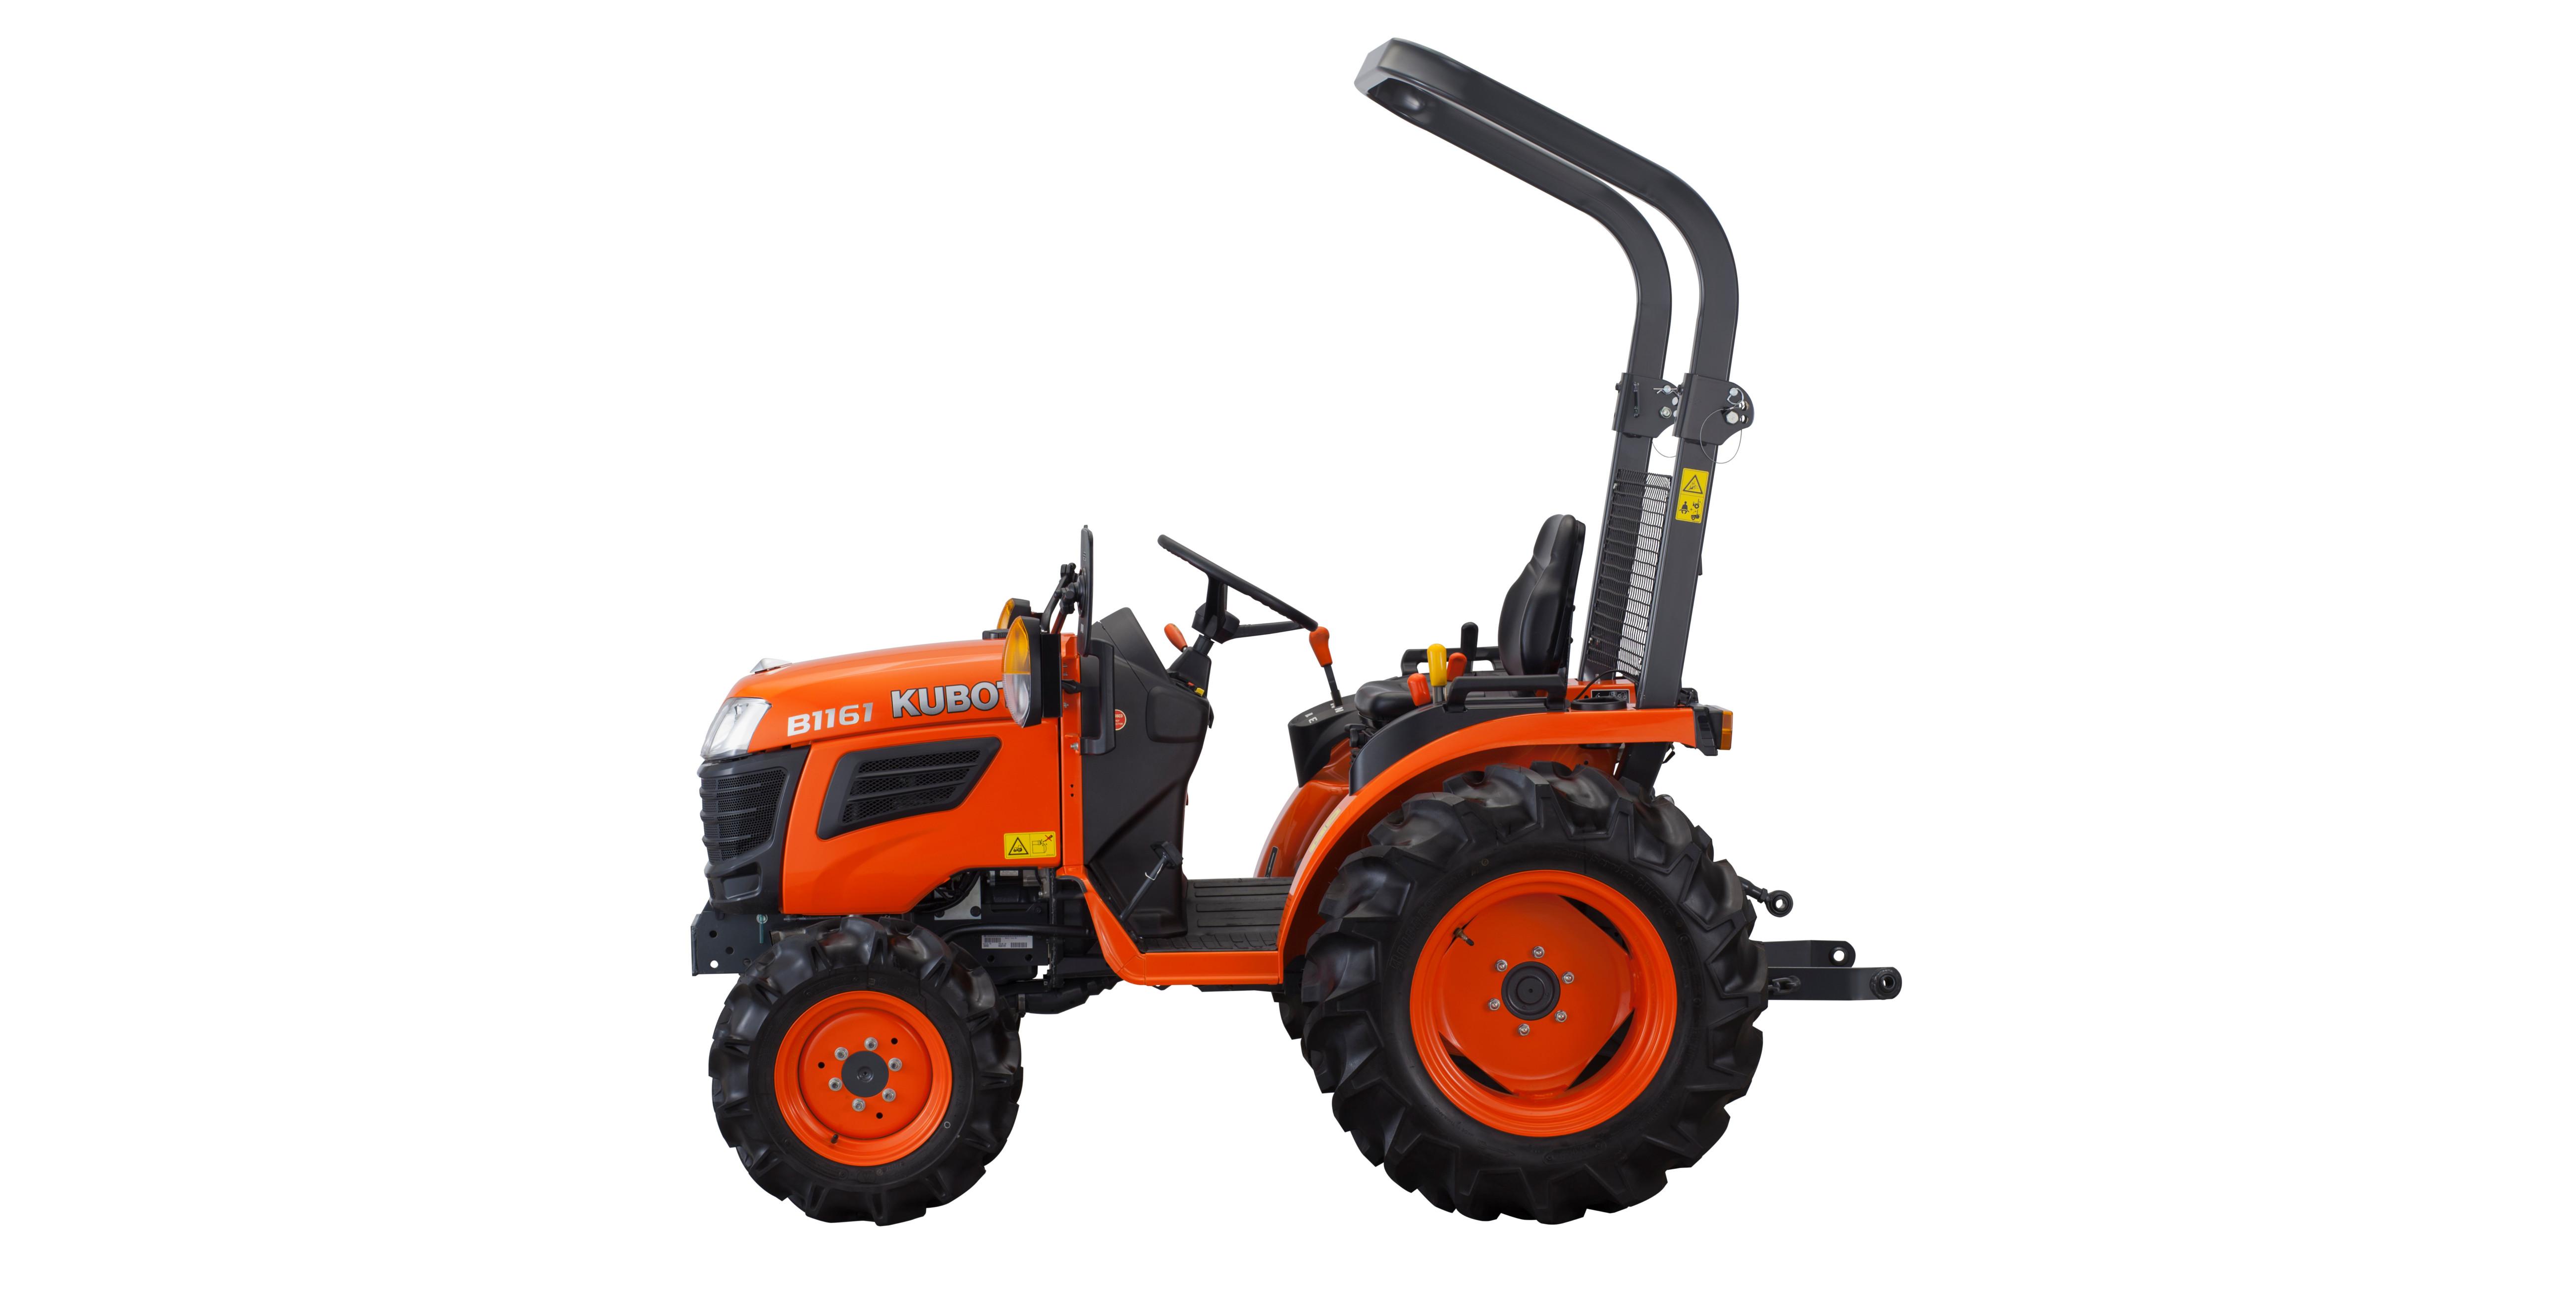 Kompak Traktoren B1161 - KUBOTA